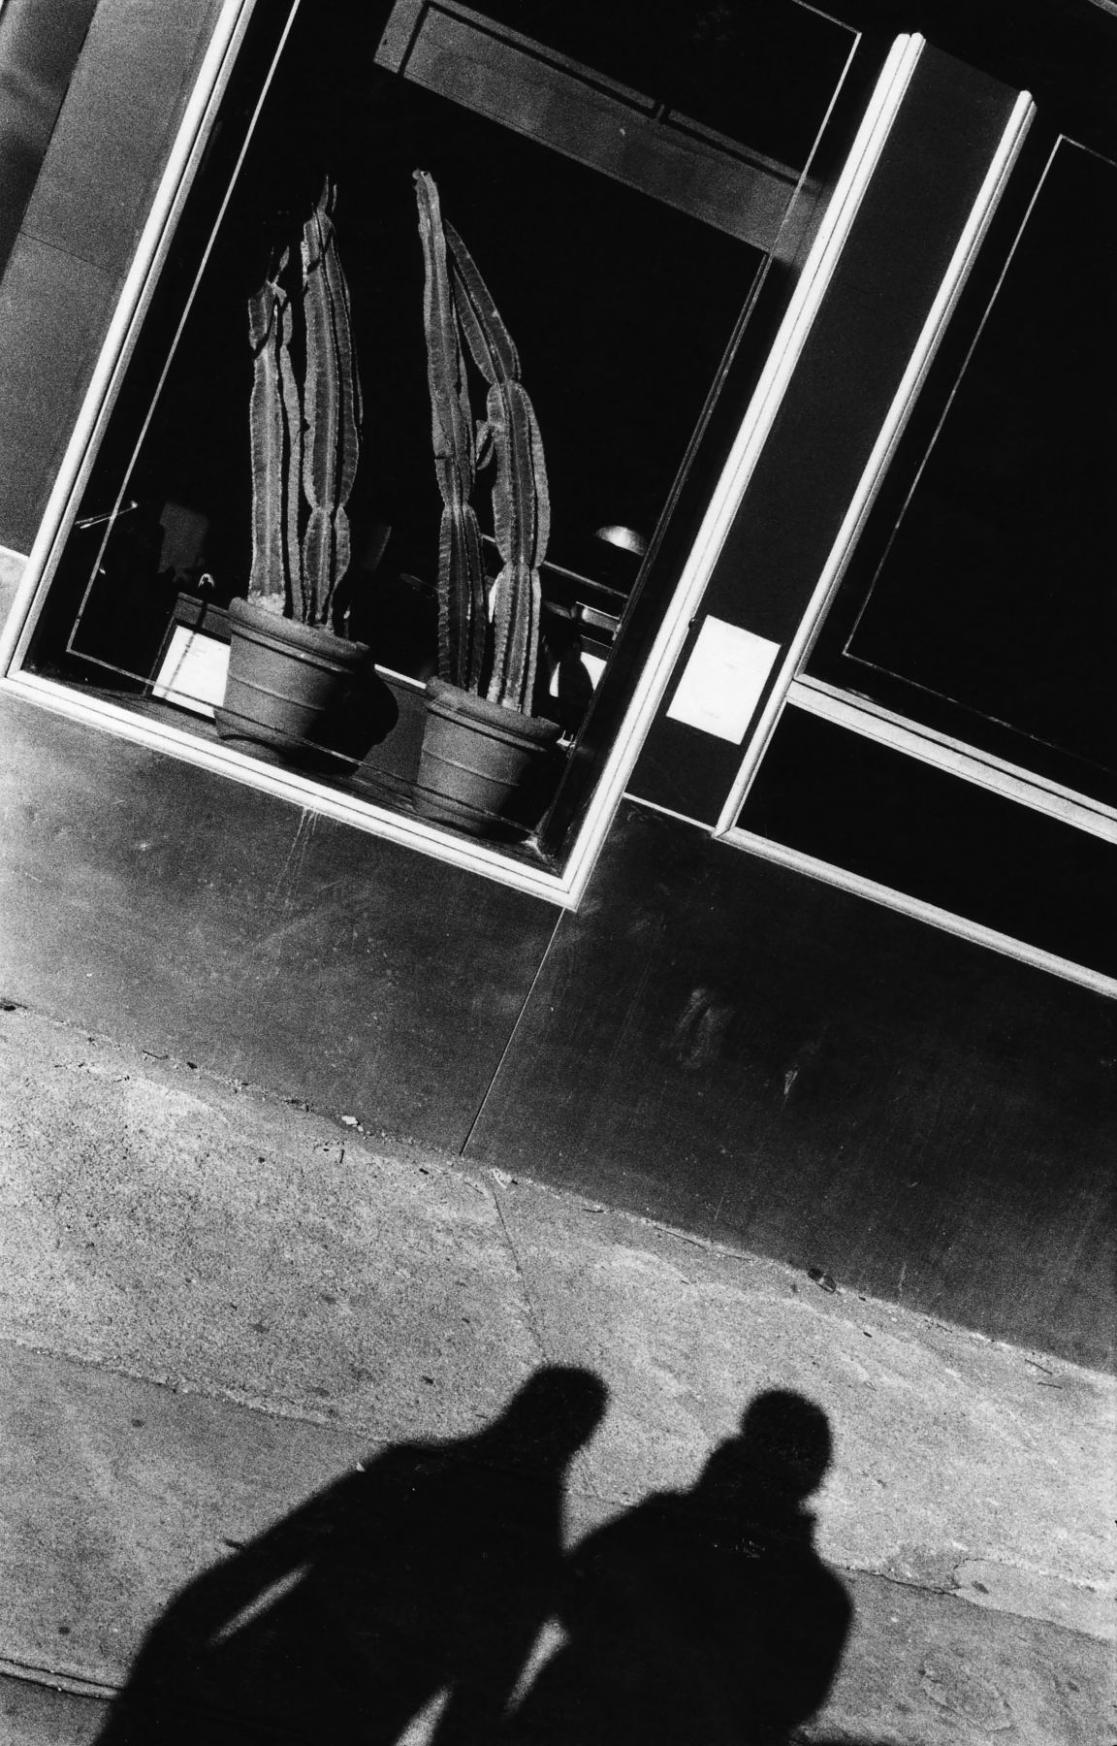 Anthony Barboza, Cactus & Shadows